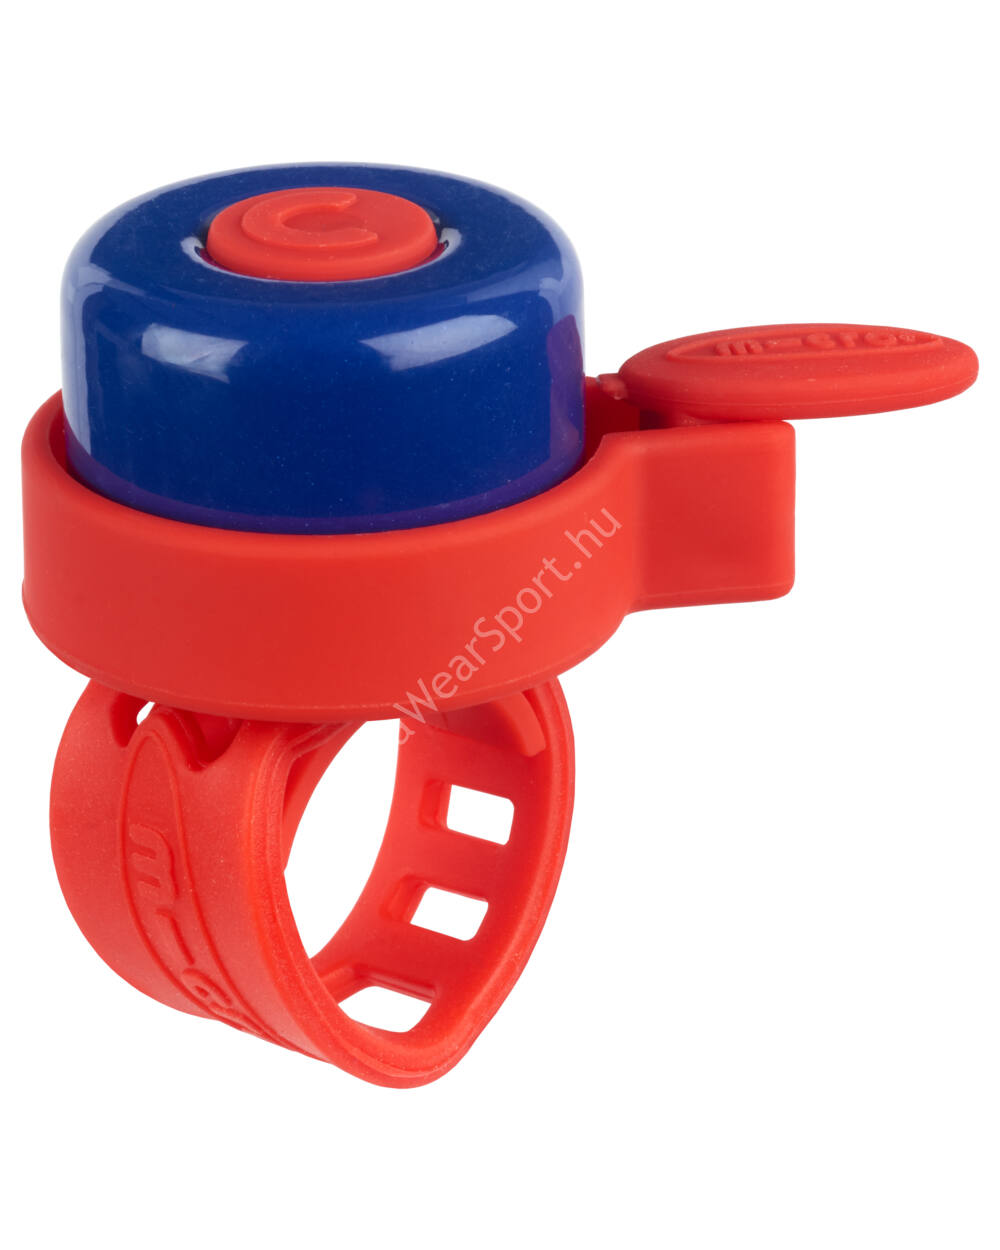 Micro roller csengő, piros-kék